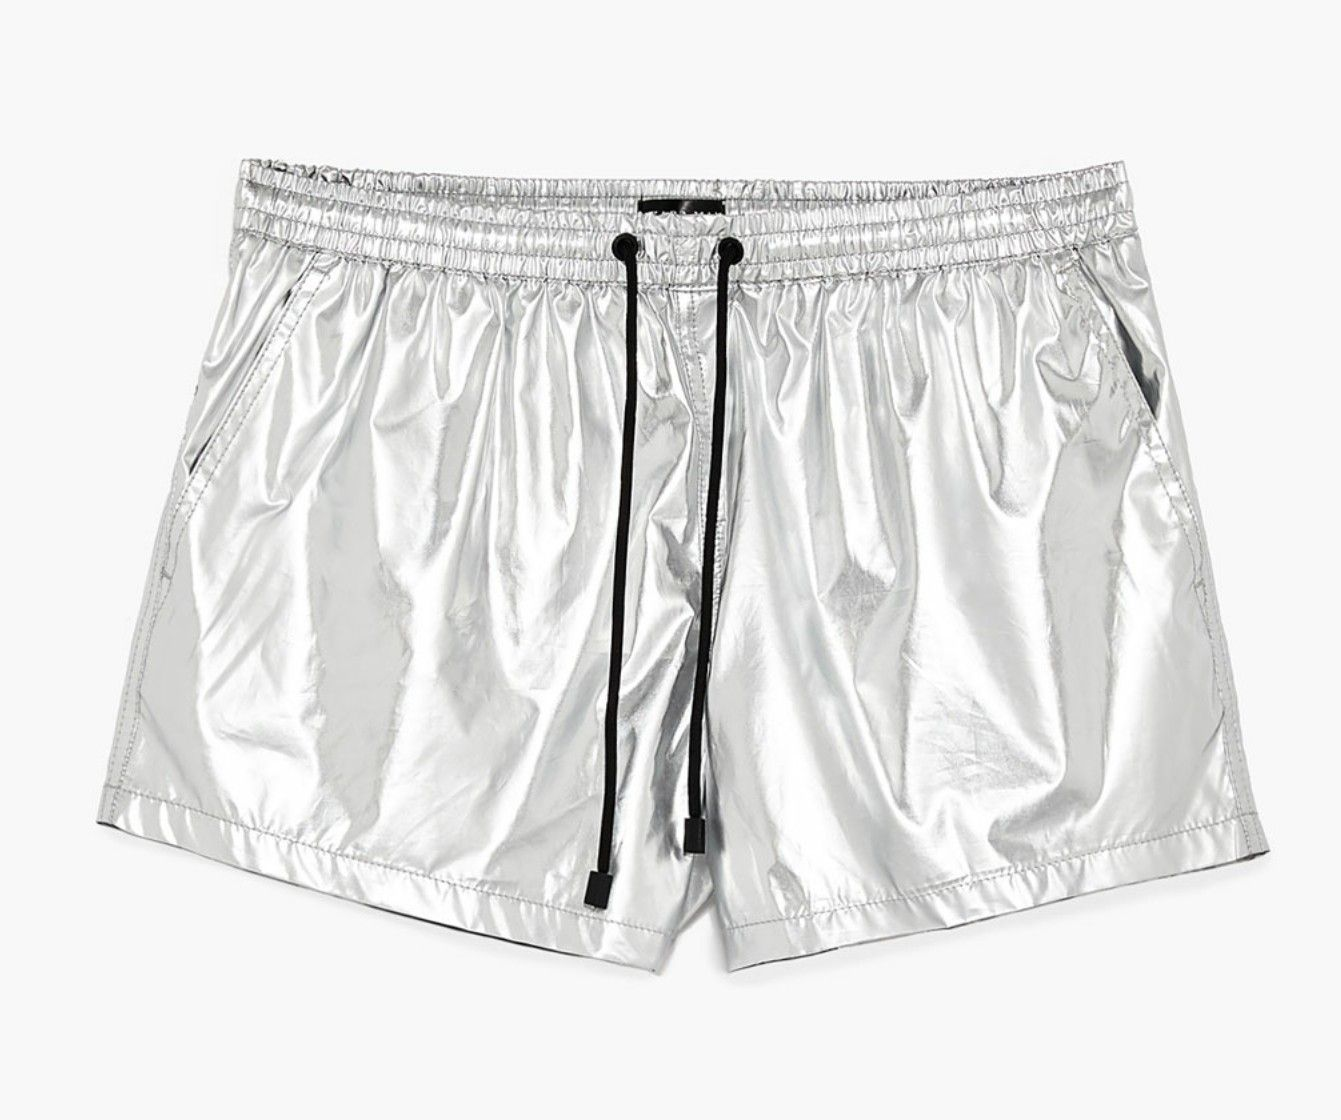 Zara metallic silver trunks